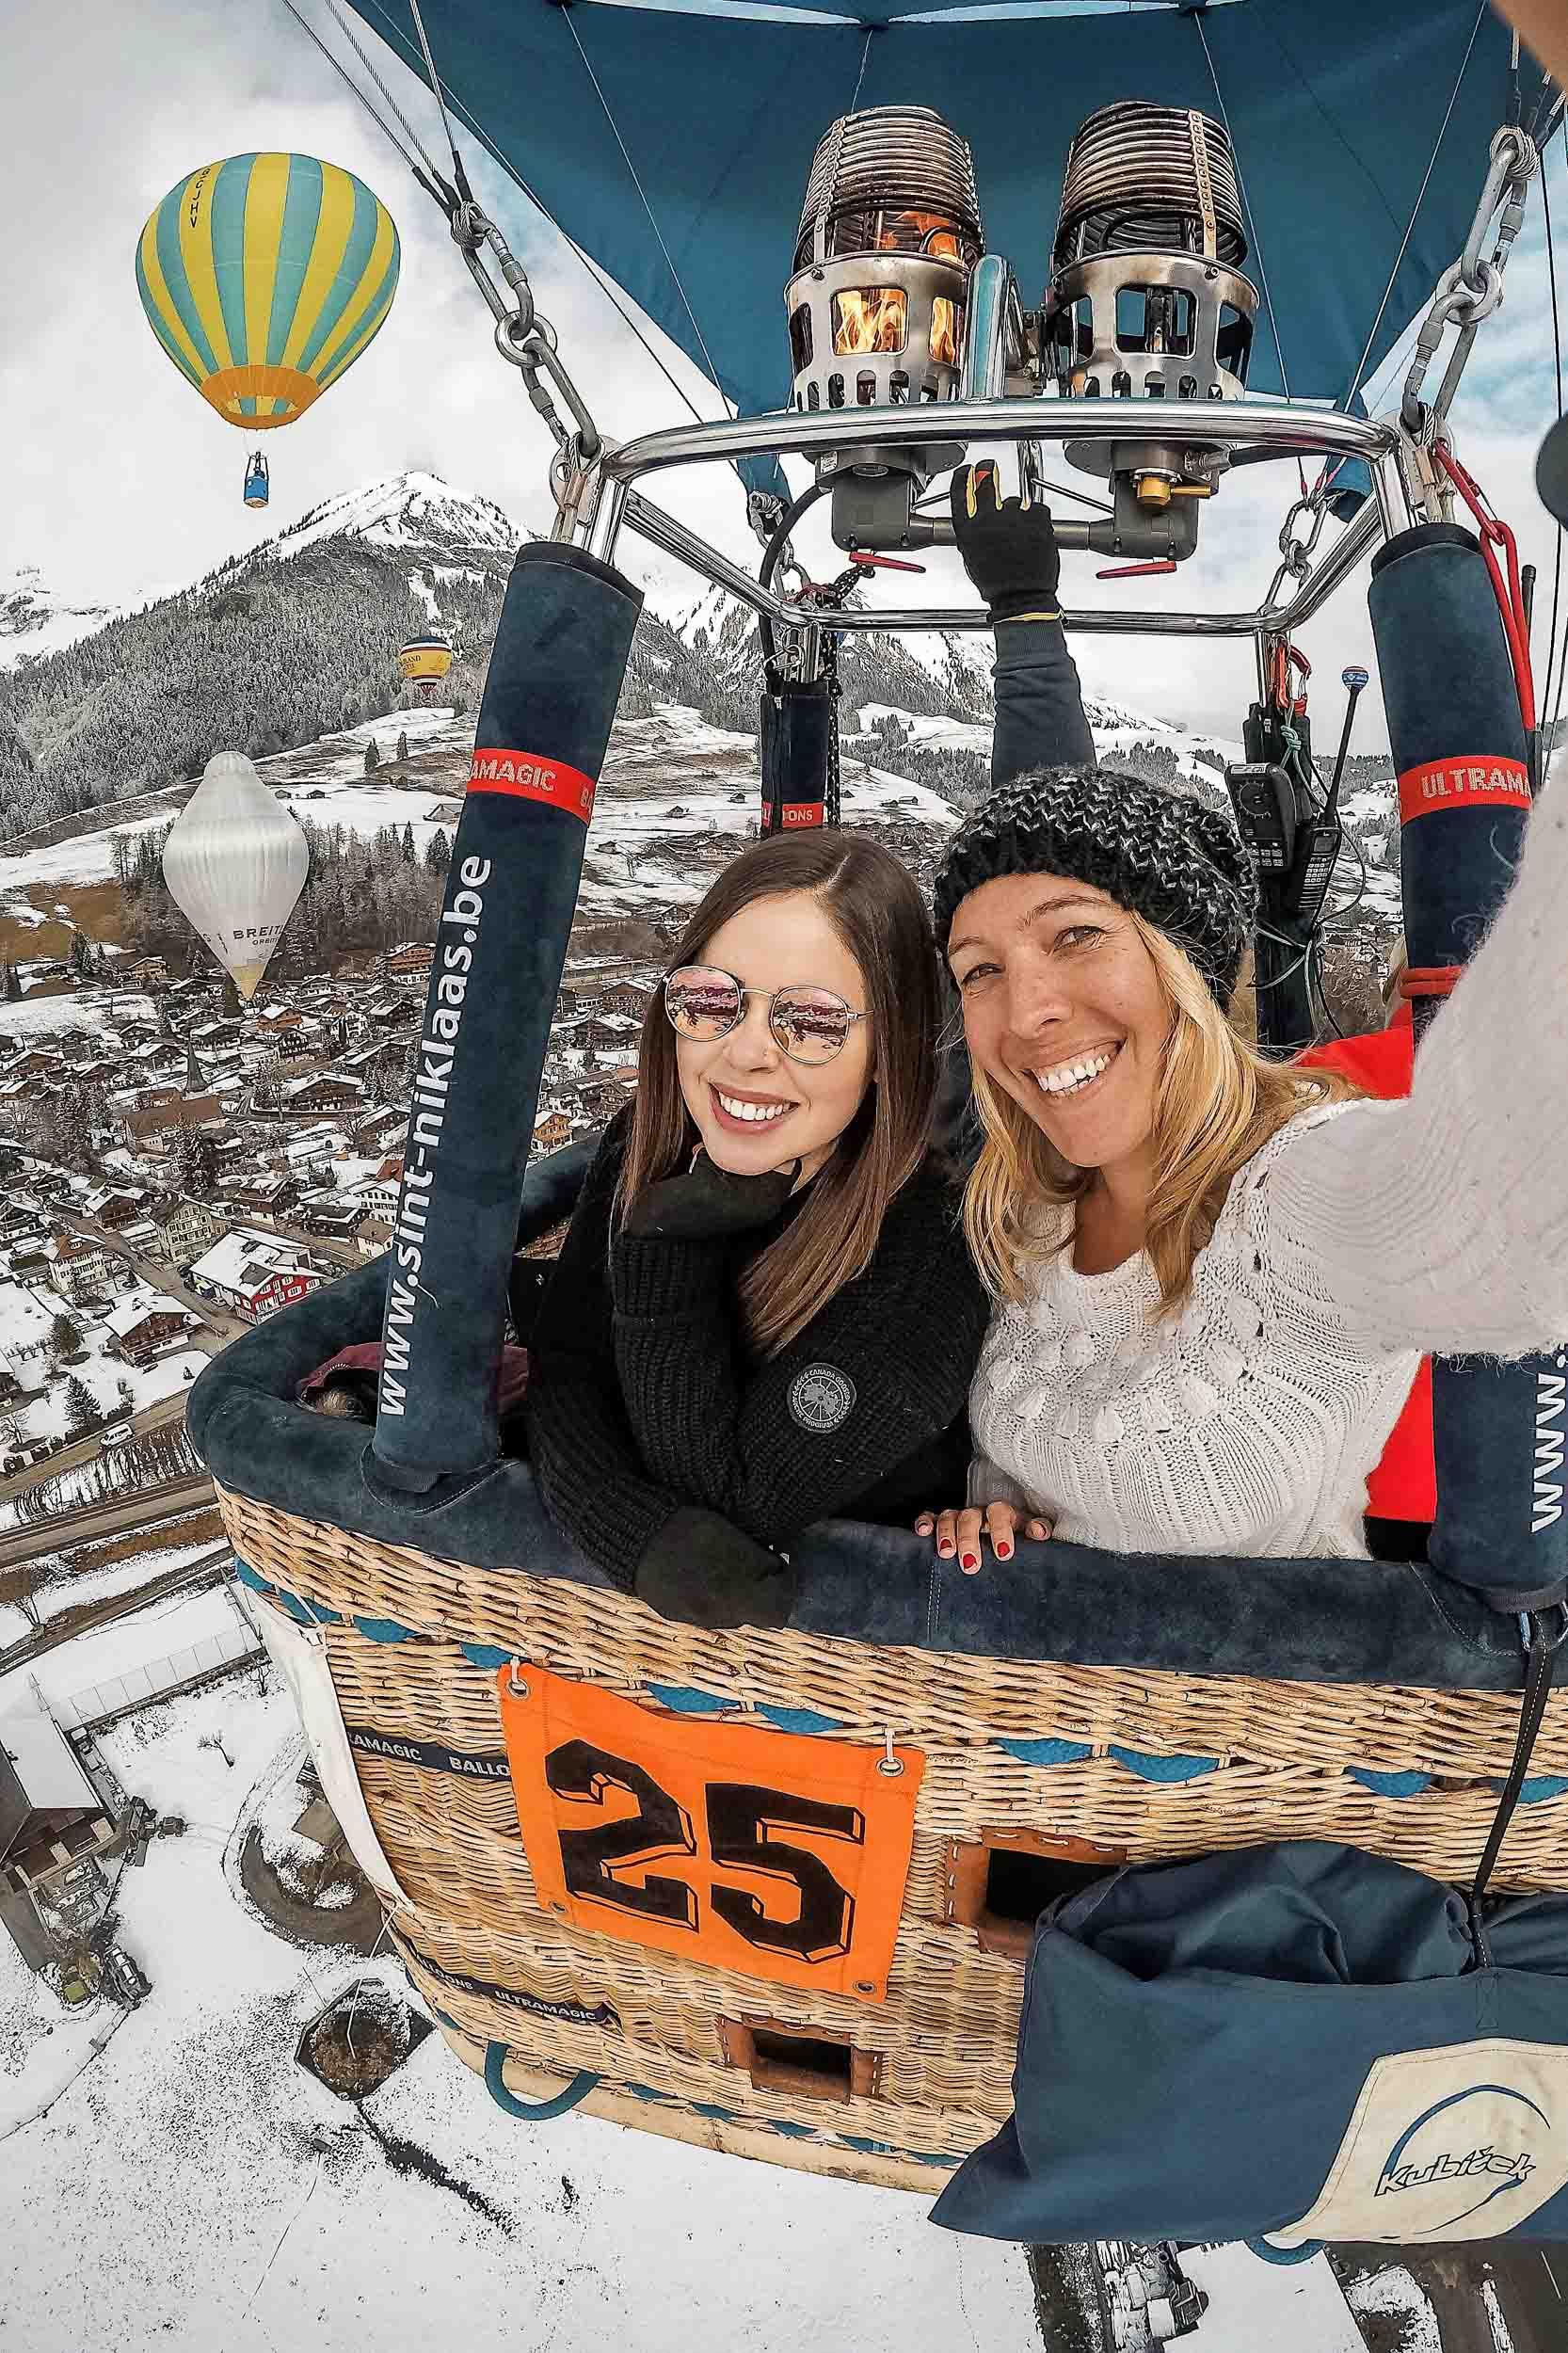 Hot air balloon ride in Chateau d'Oex